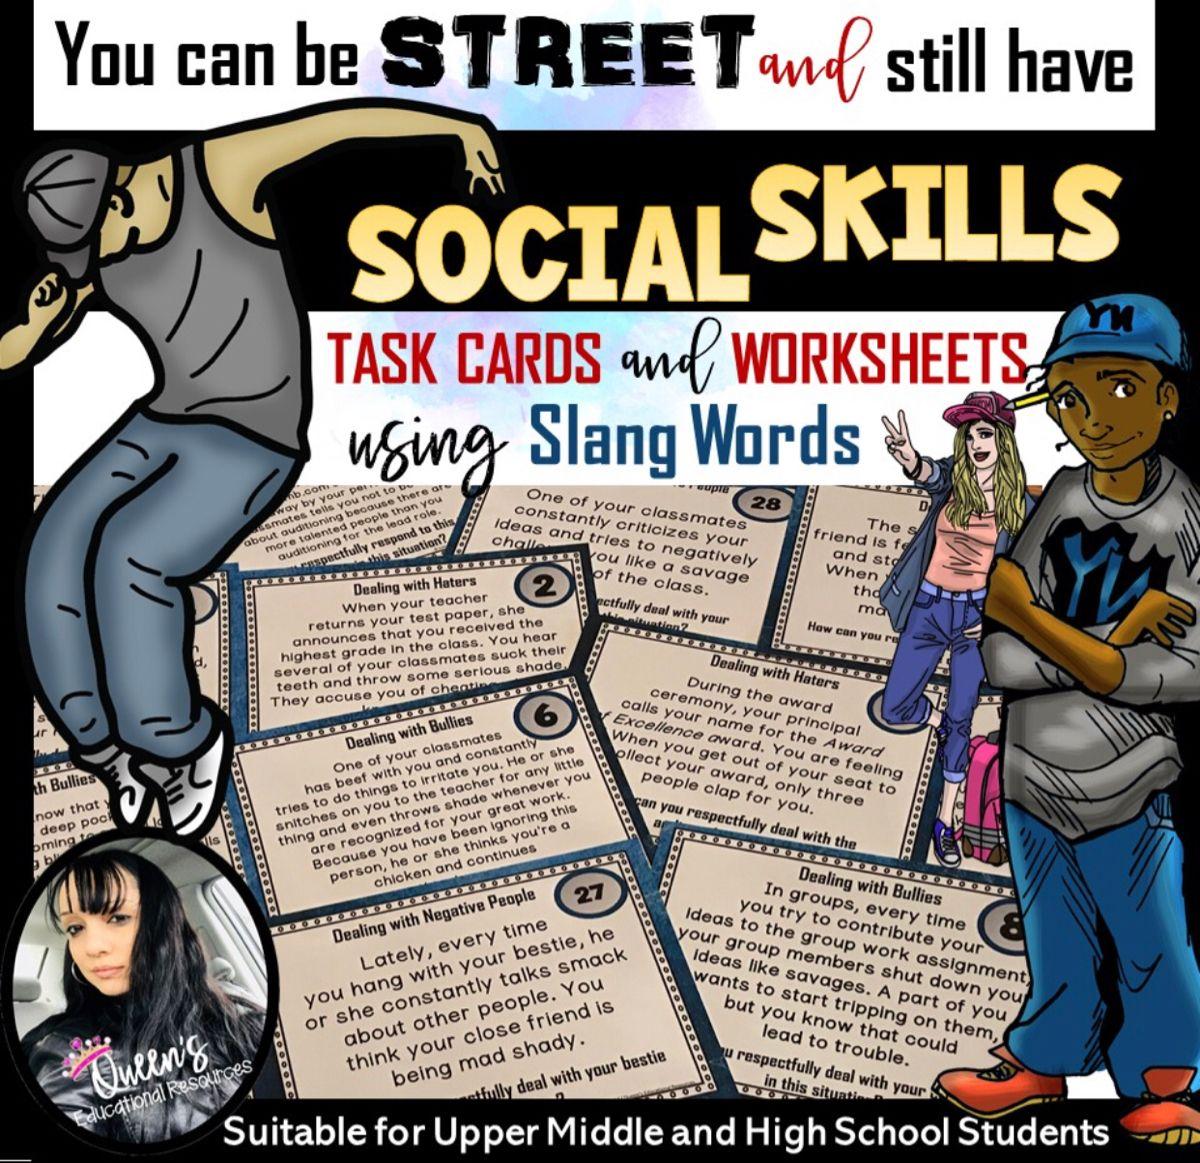 Social Skills Task Cards And Worksheets Using Slang Words